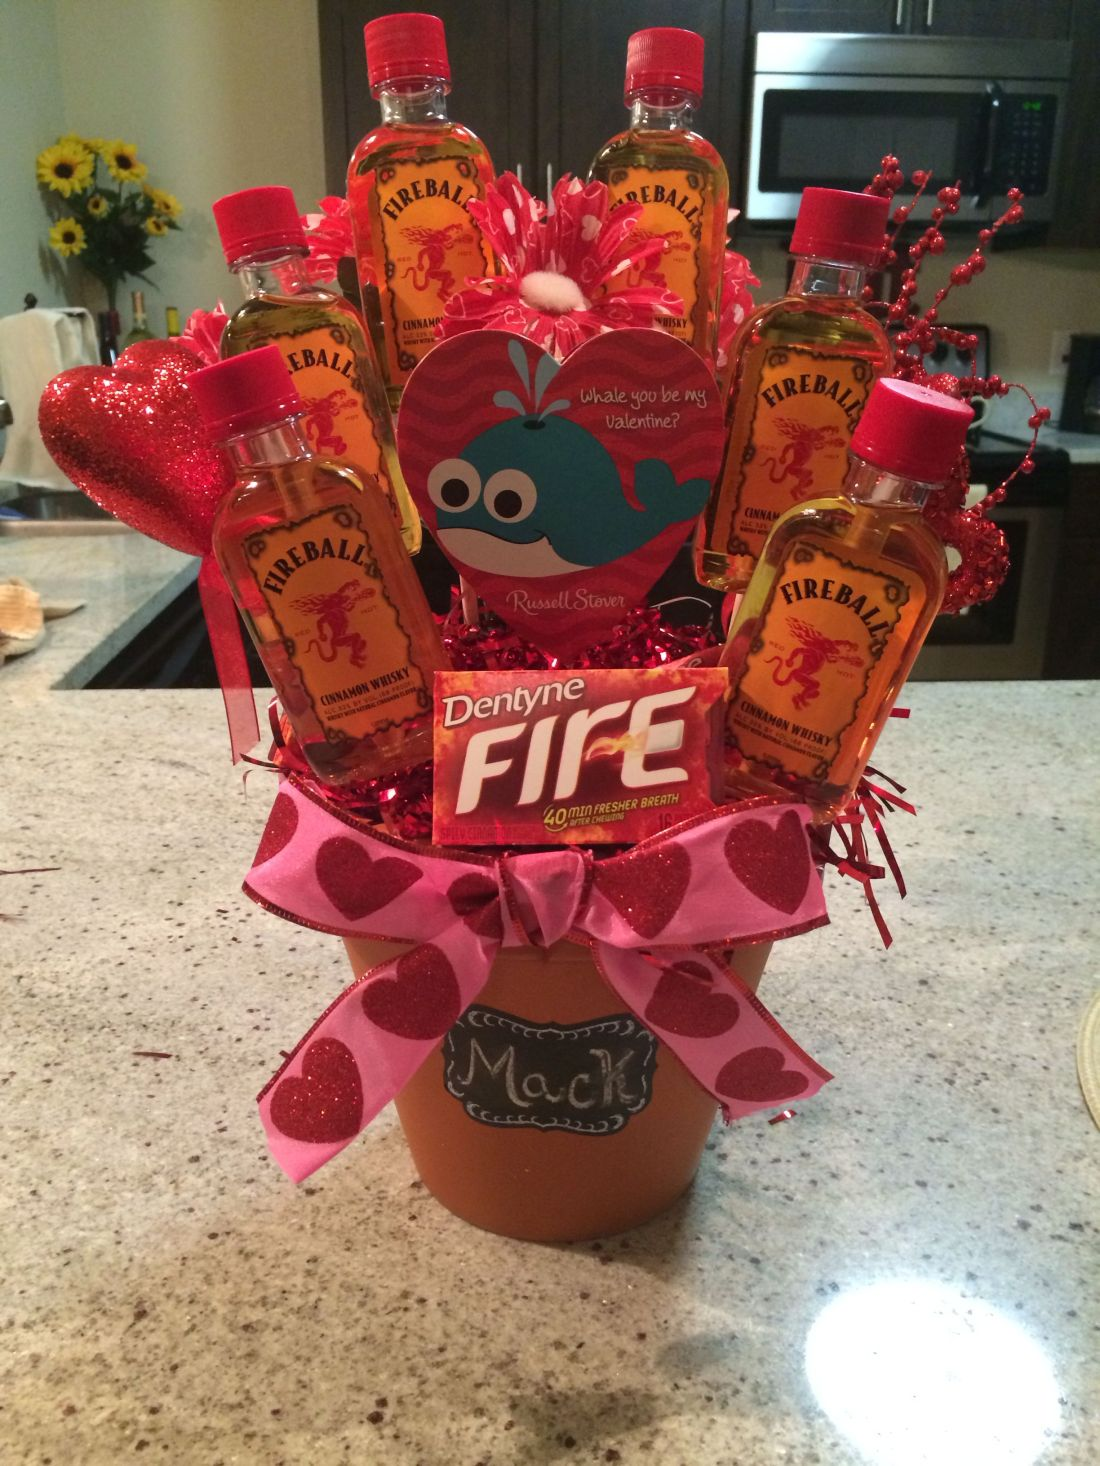 Fireball liquor bouquet for valentines day craftsdiy